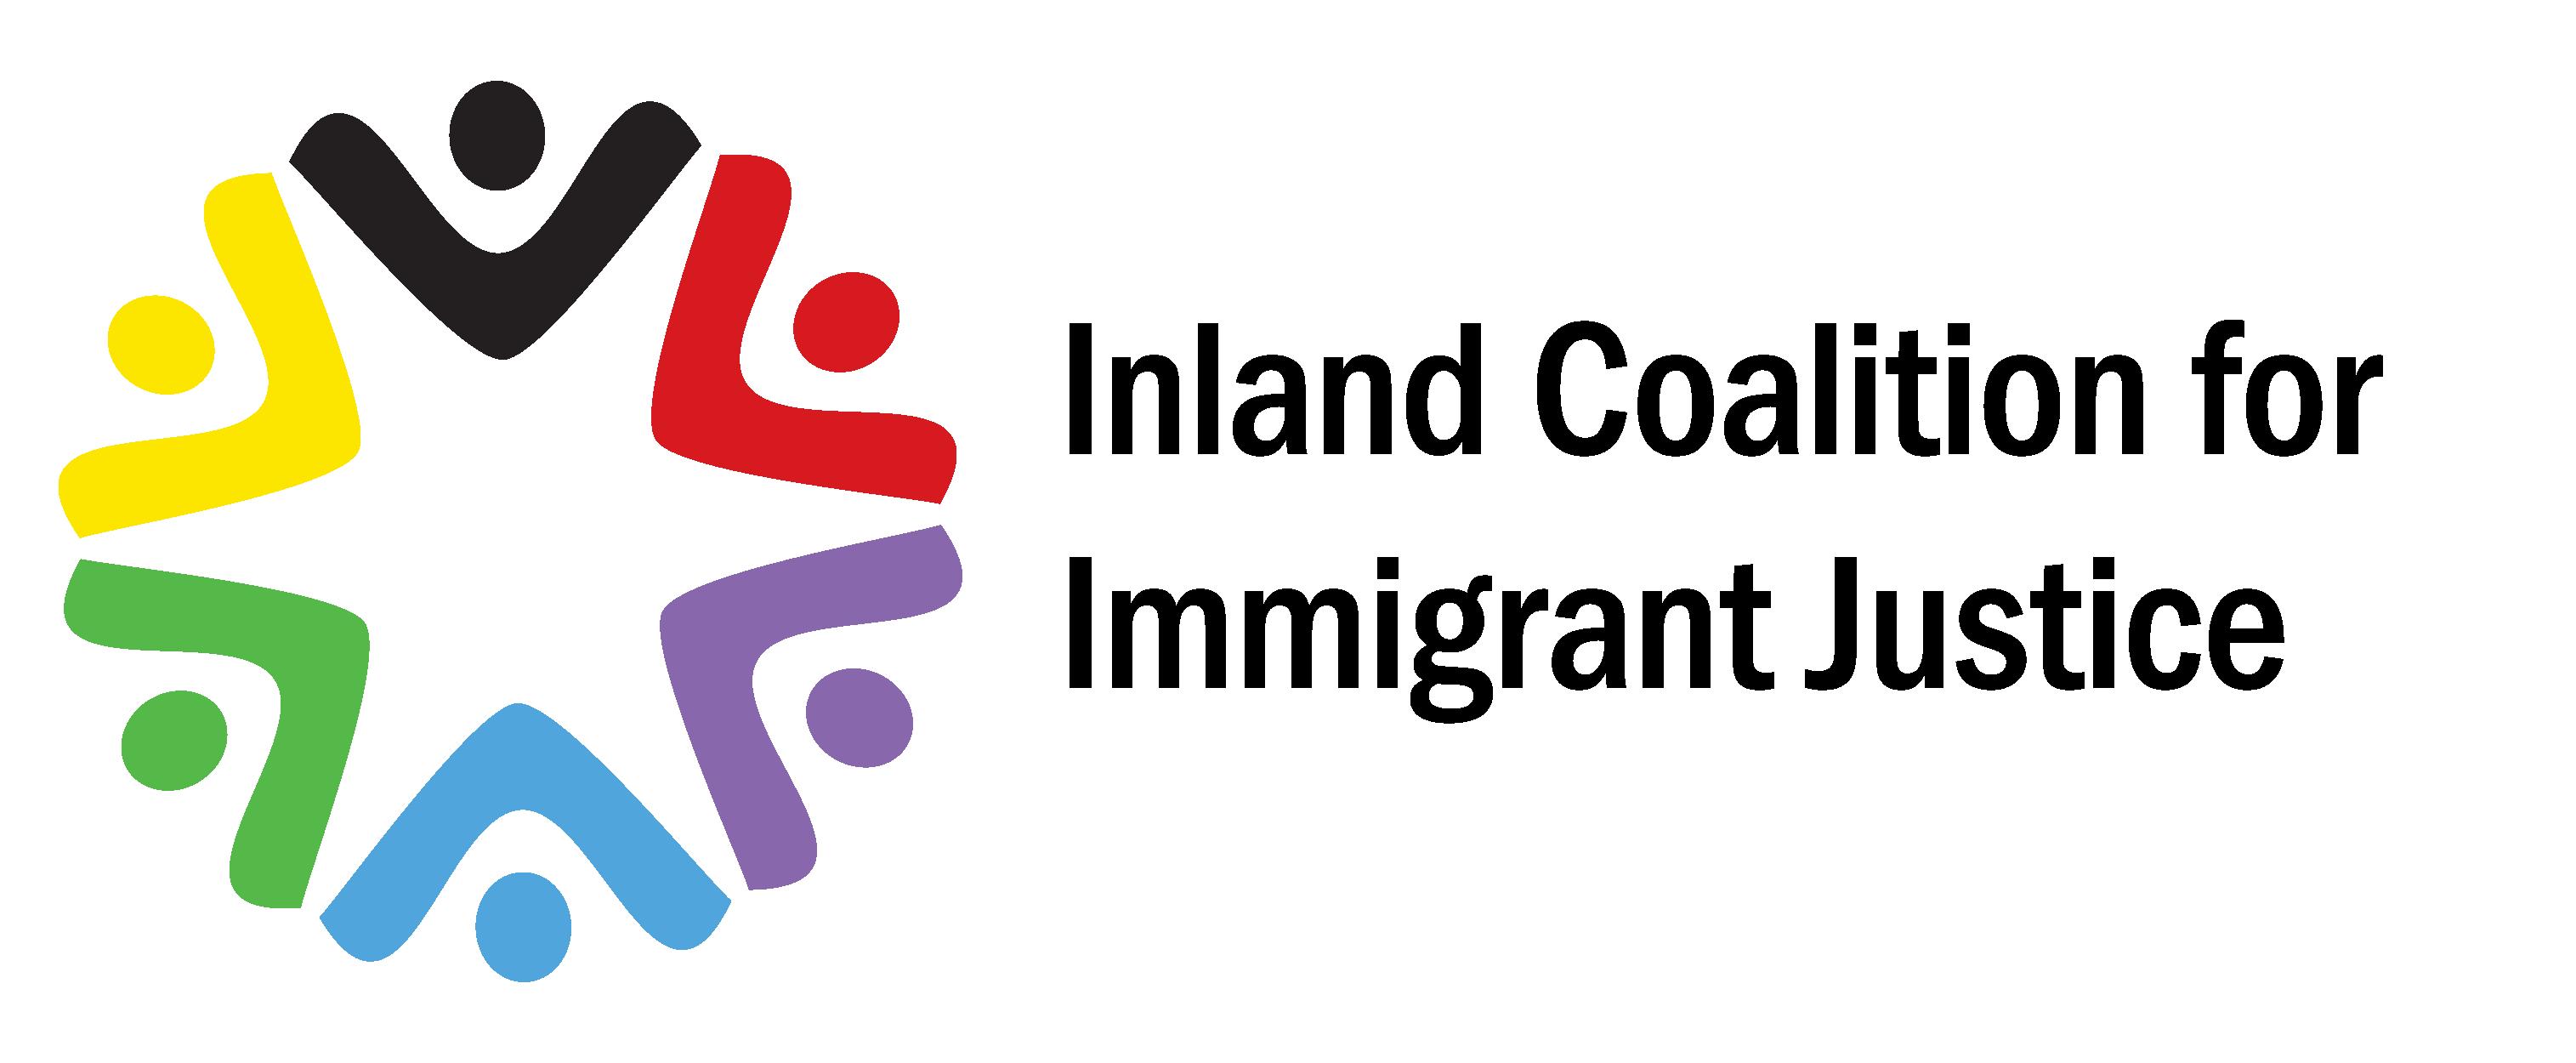 ICIJ color logo (2)